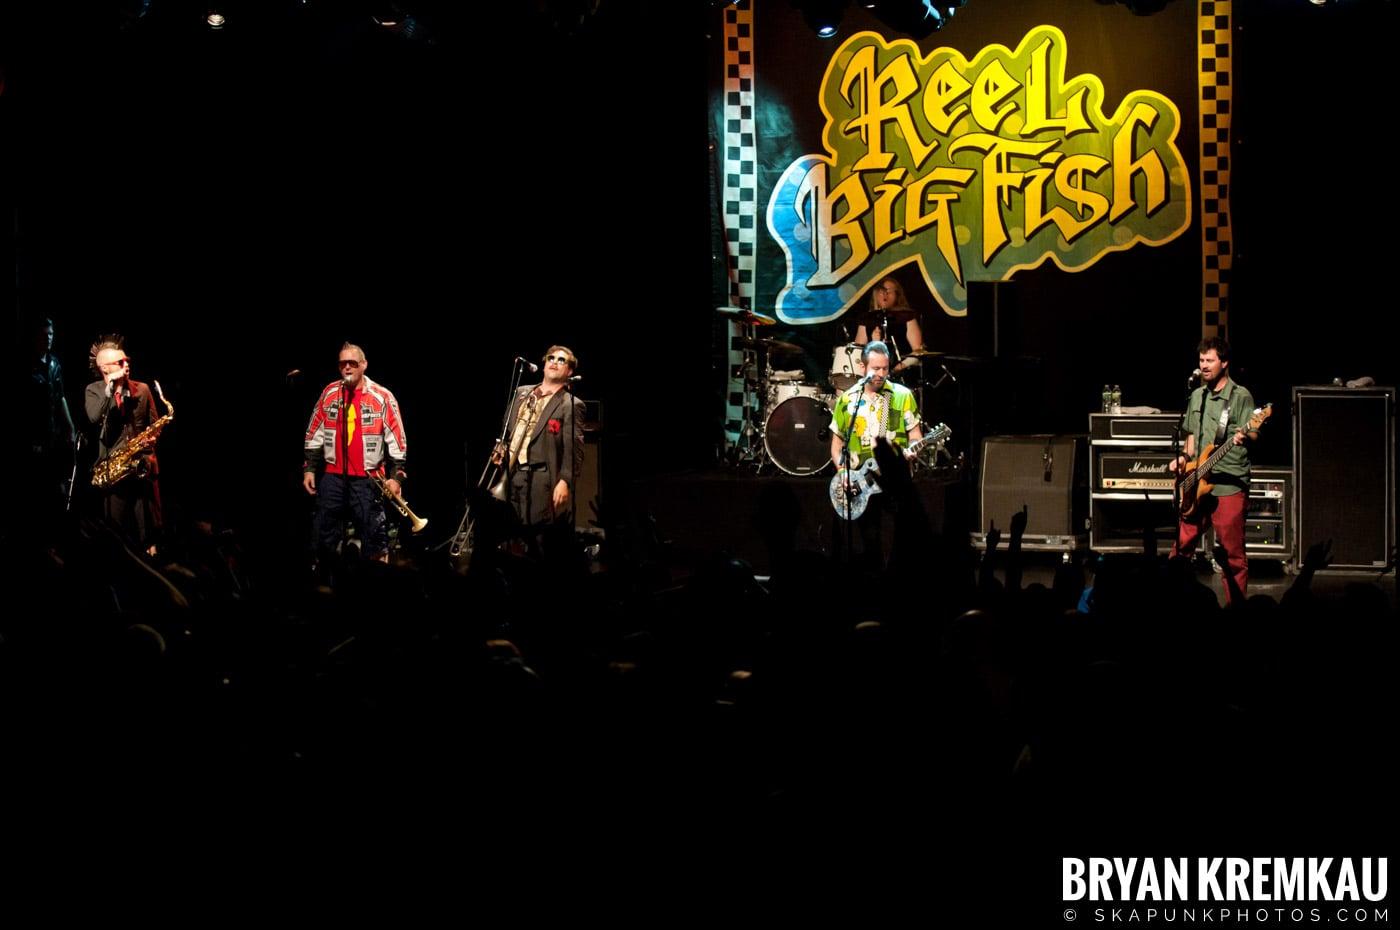 Reel Big Fish @ Best Buy Theater, NYC - 6.27.12 (2)